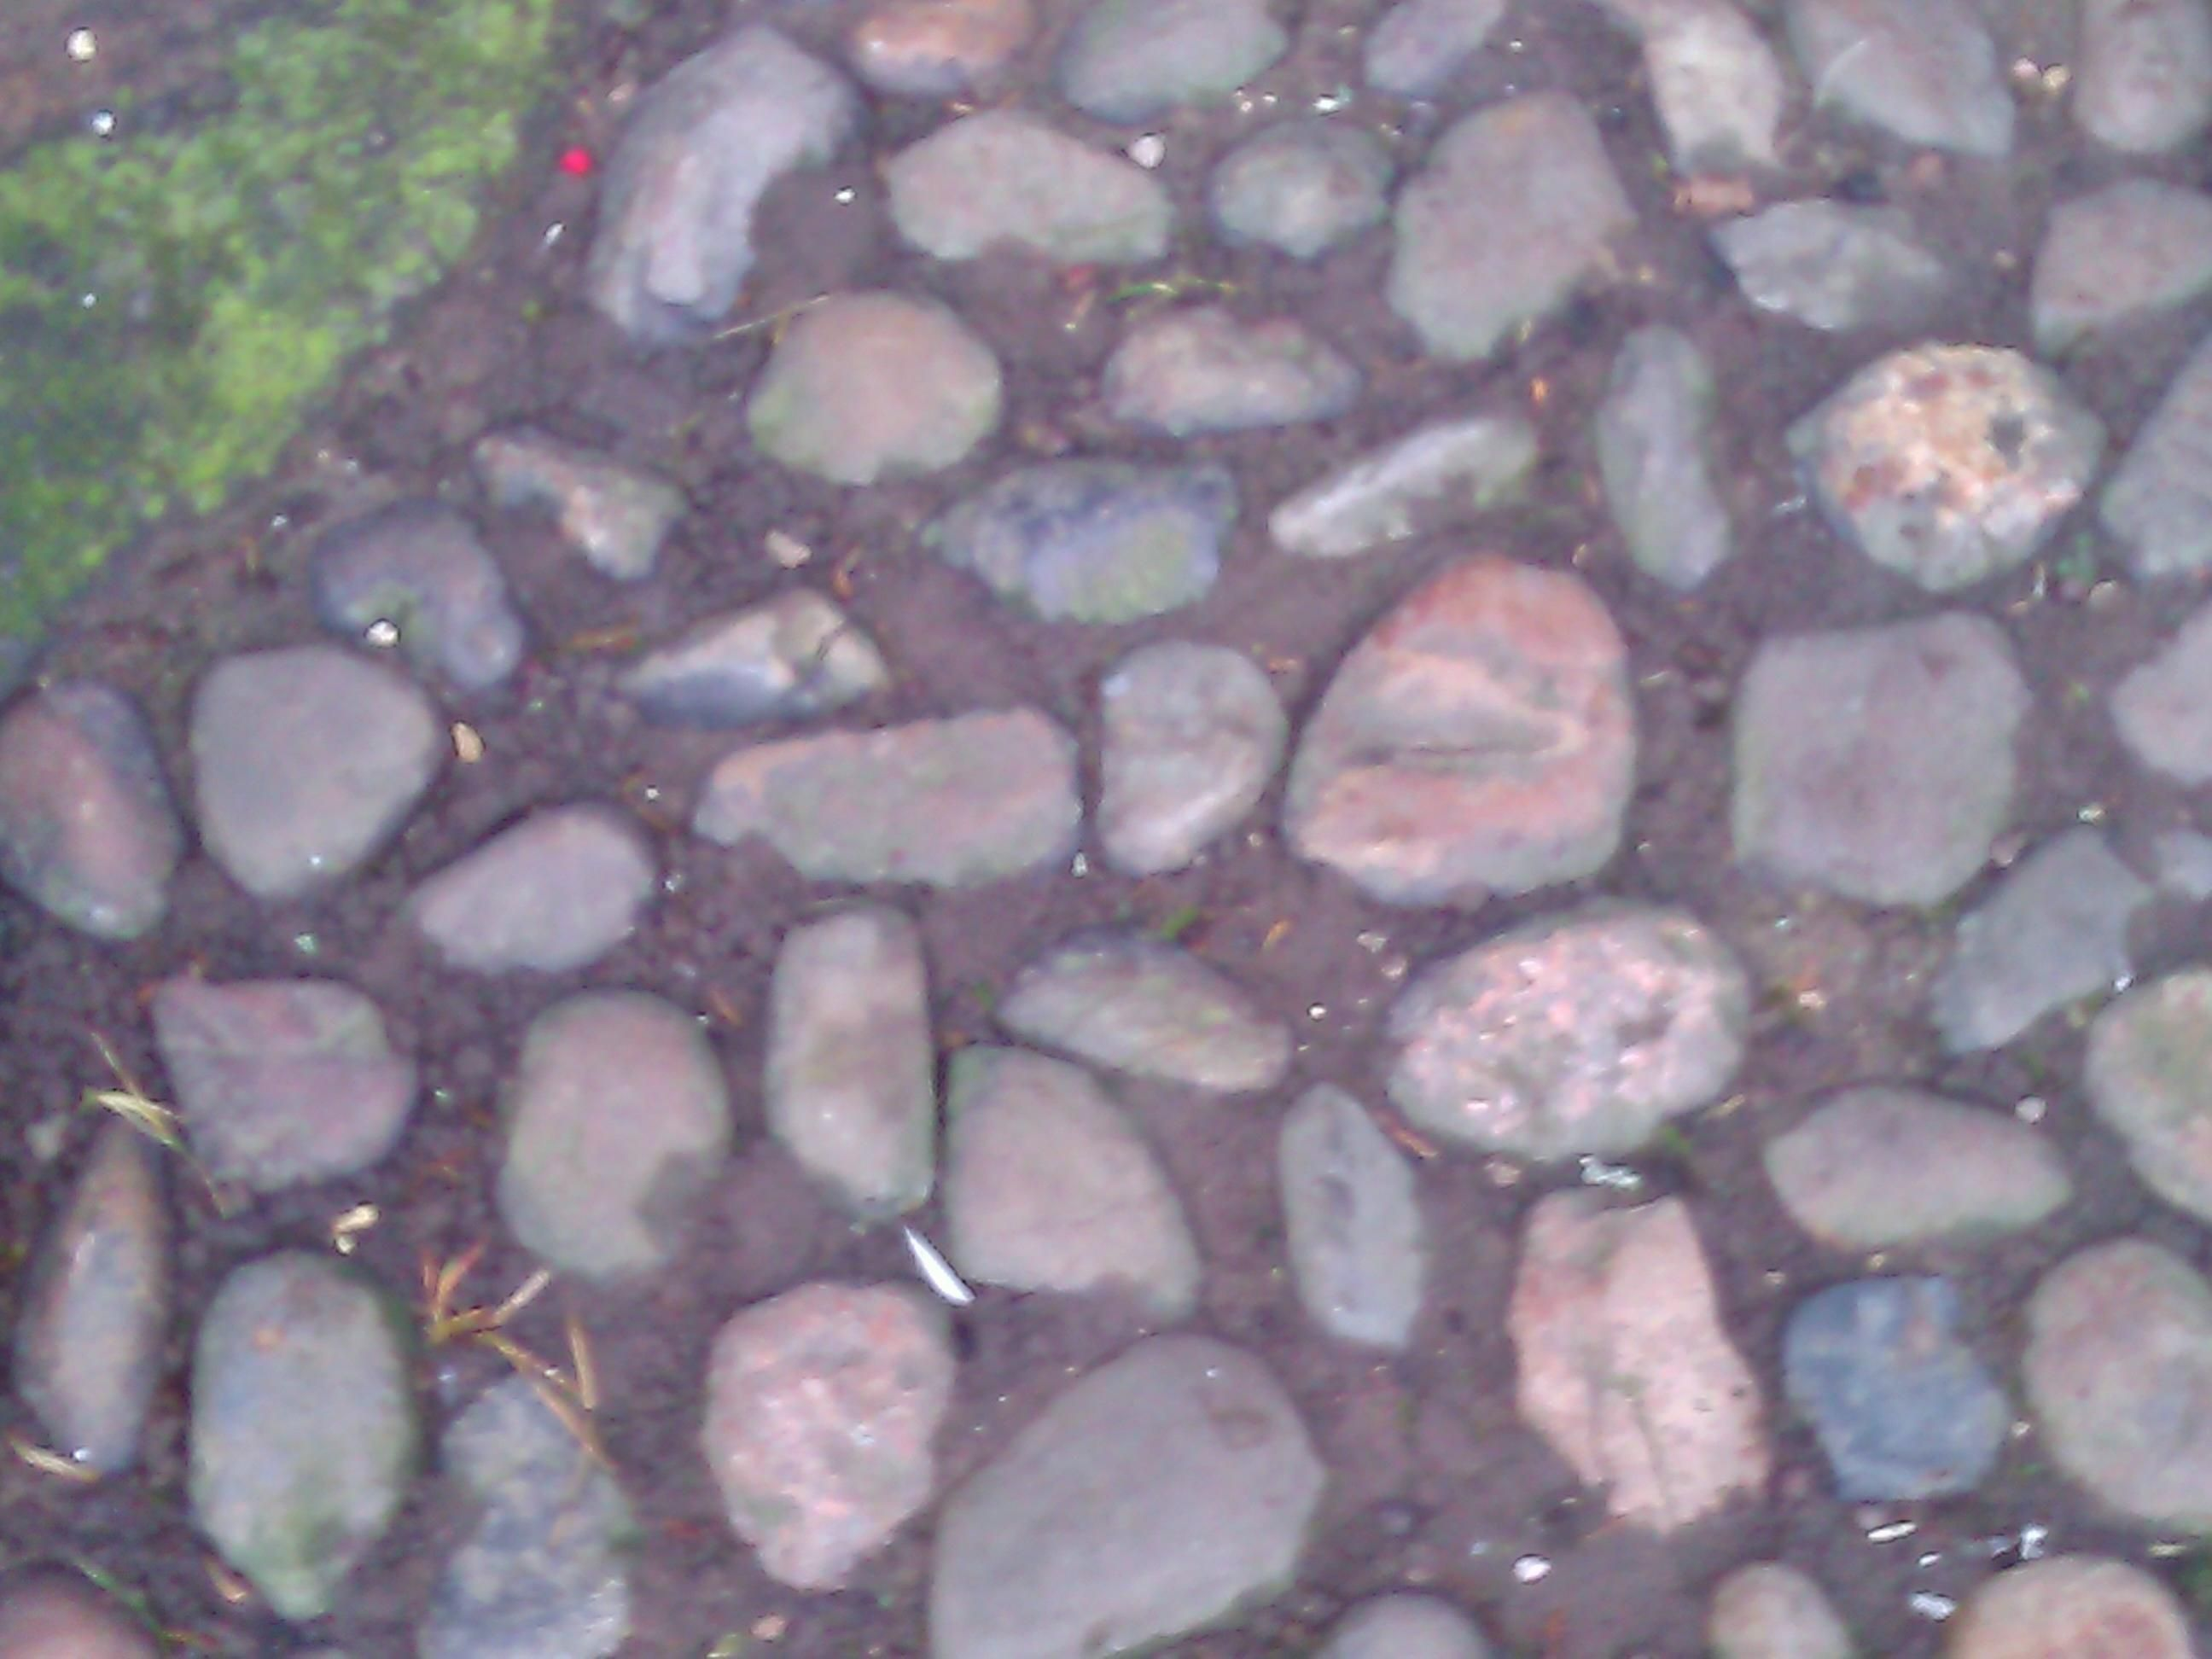 Pebble path at Little Moreton Hall, Cheshire.